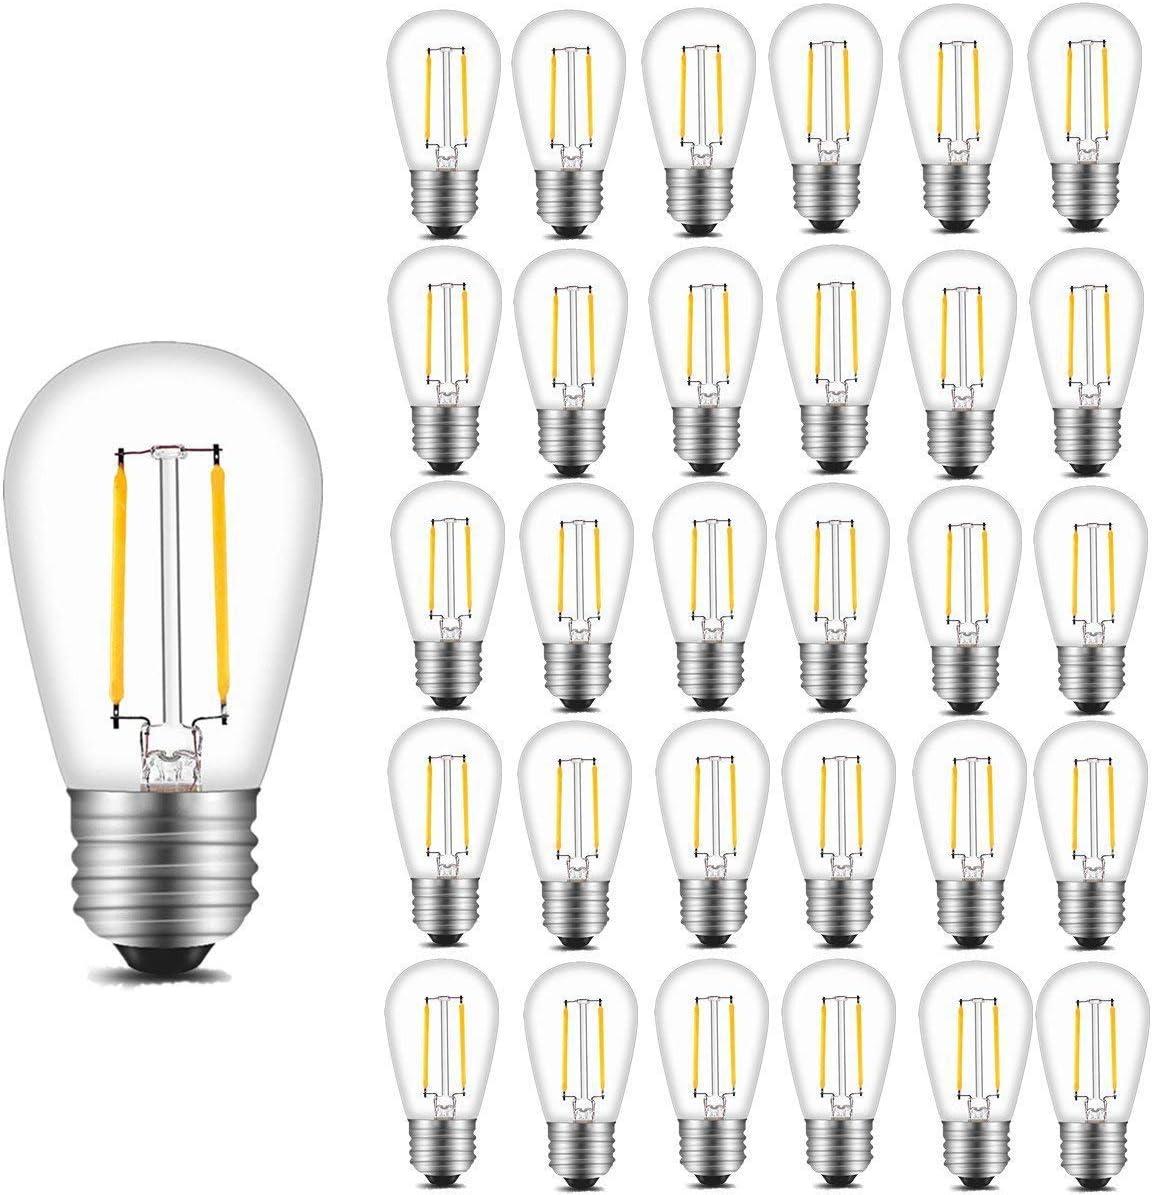 INNOCCY Nashville-Davidson Mall Vintage S14 LED Light Bulbs Sale Special Price 200 2700K Lumens Warm Wh 2W